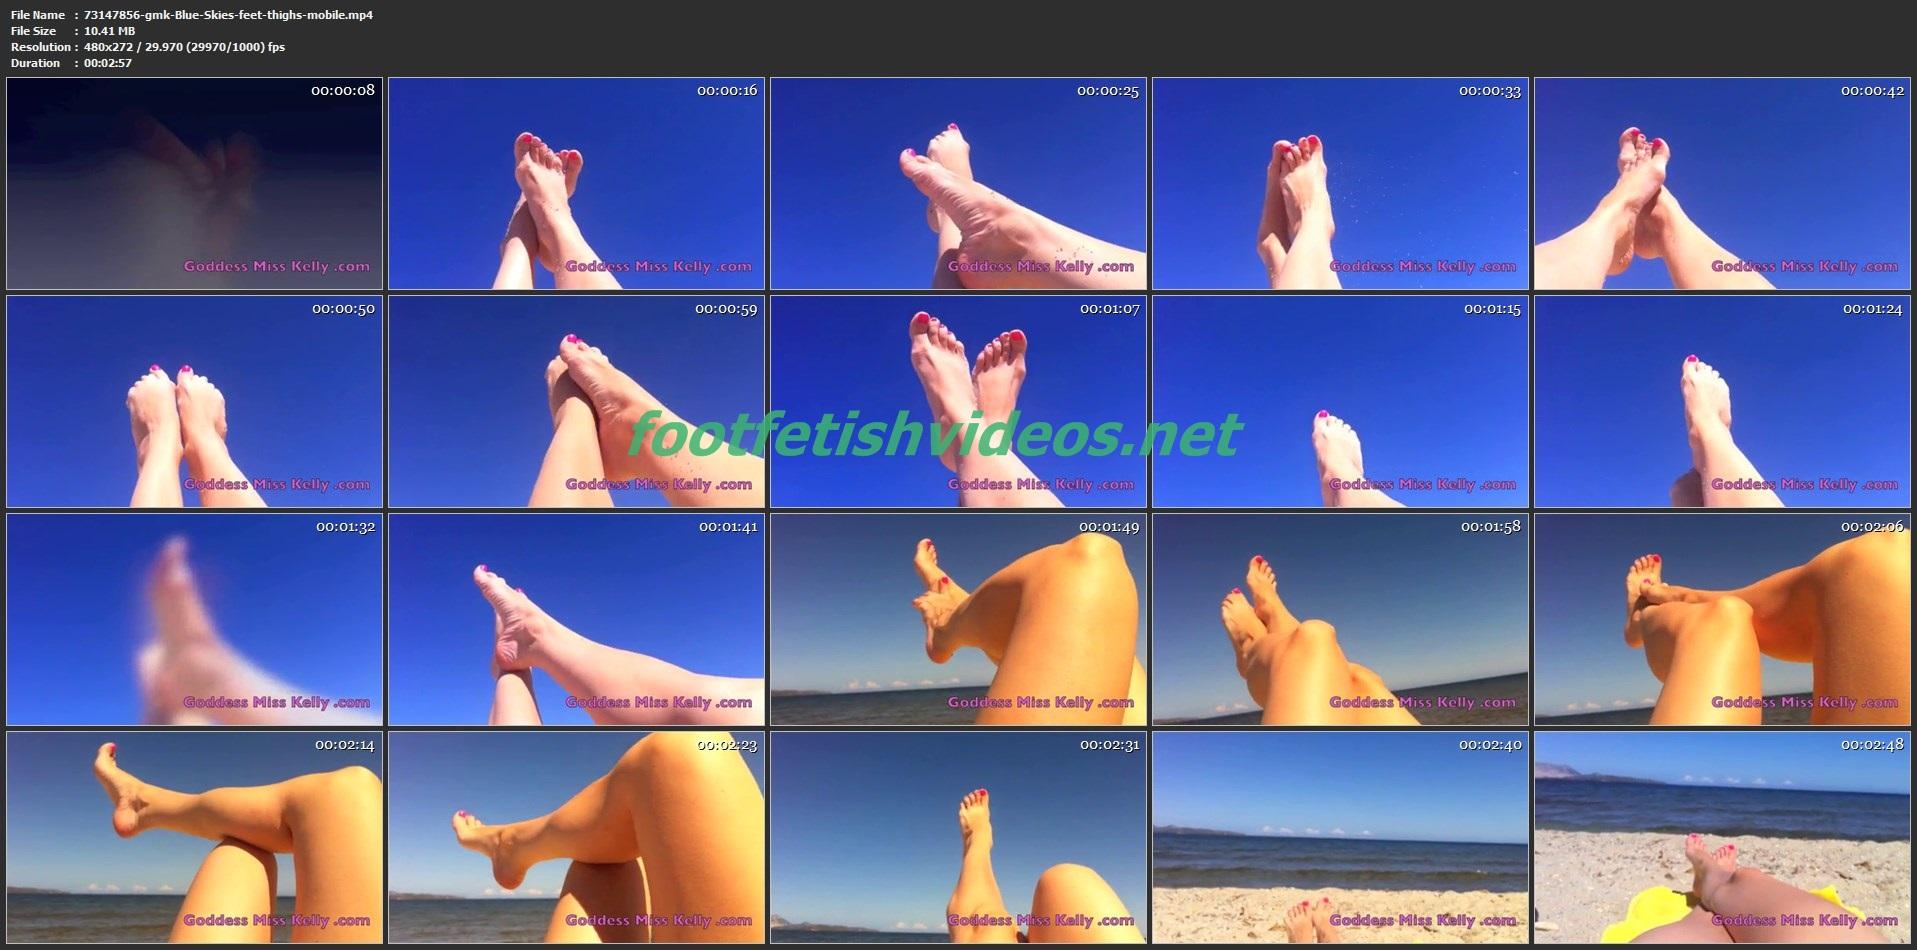 goddessmskelly-73147856-gmk-Blue-Skies-feet-thighs-mobile-mp4